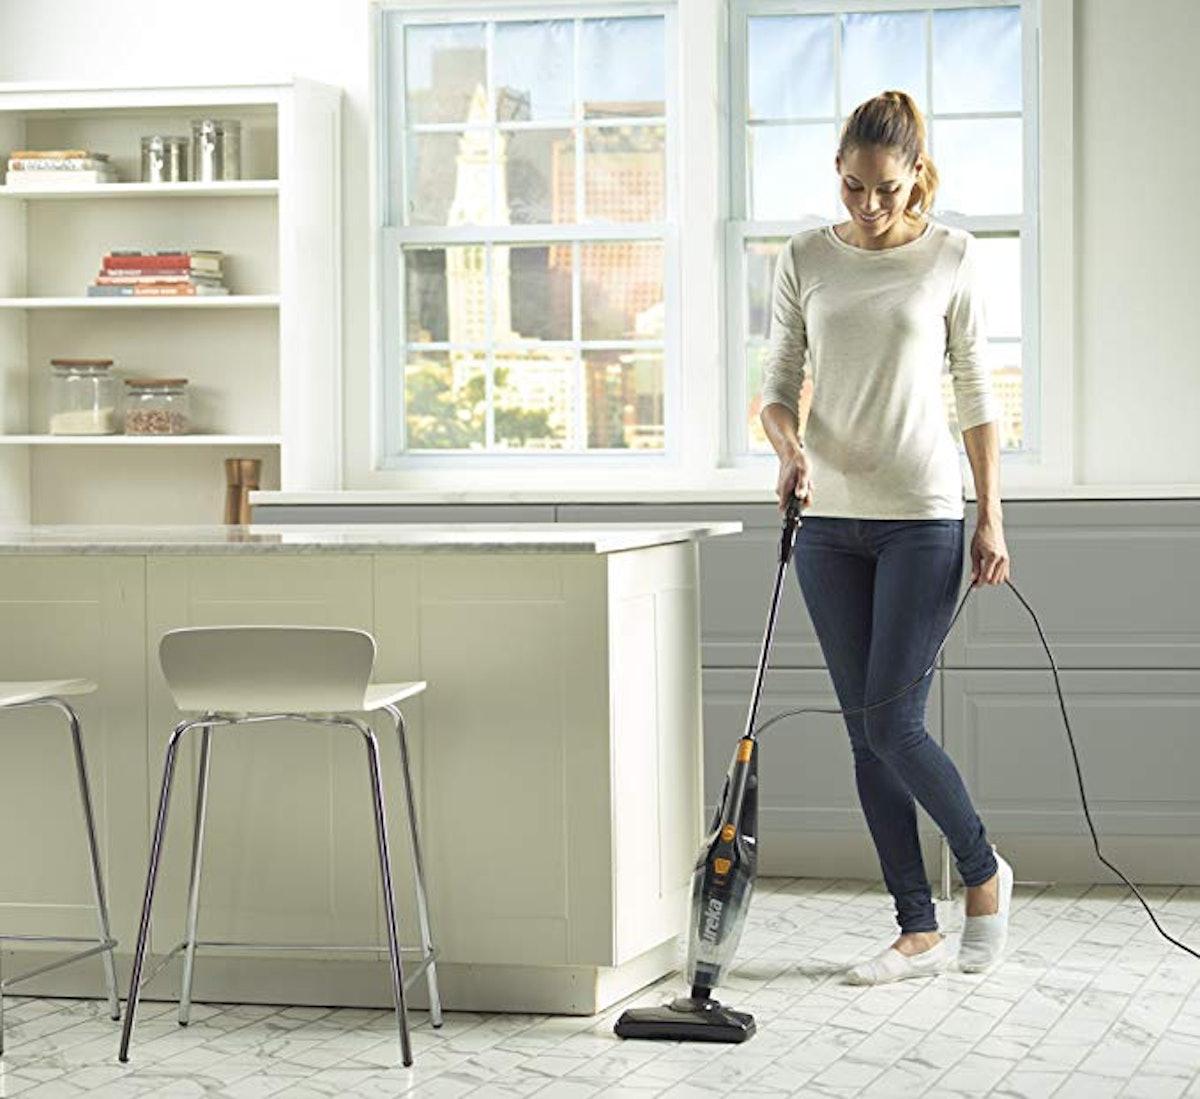 Eureka Stick Vacuum